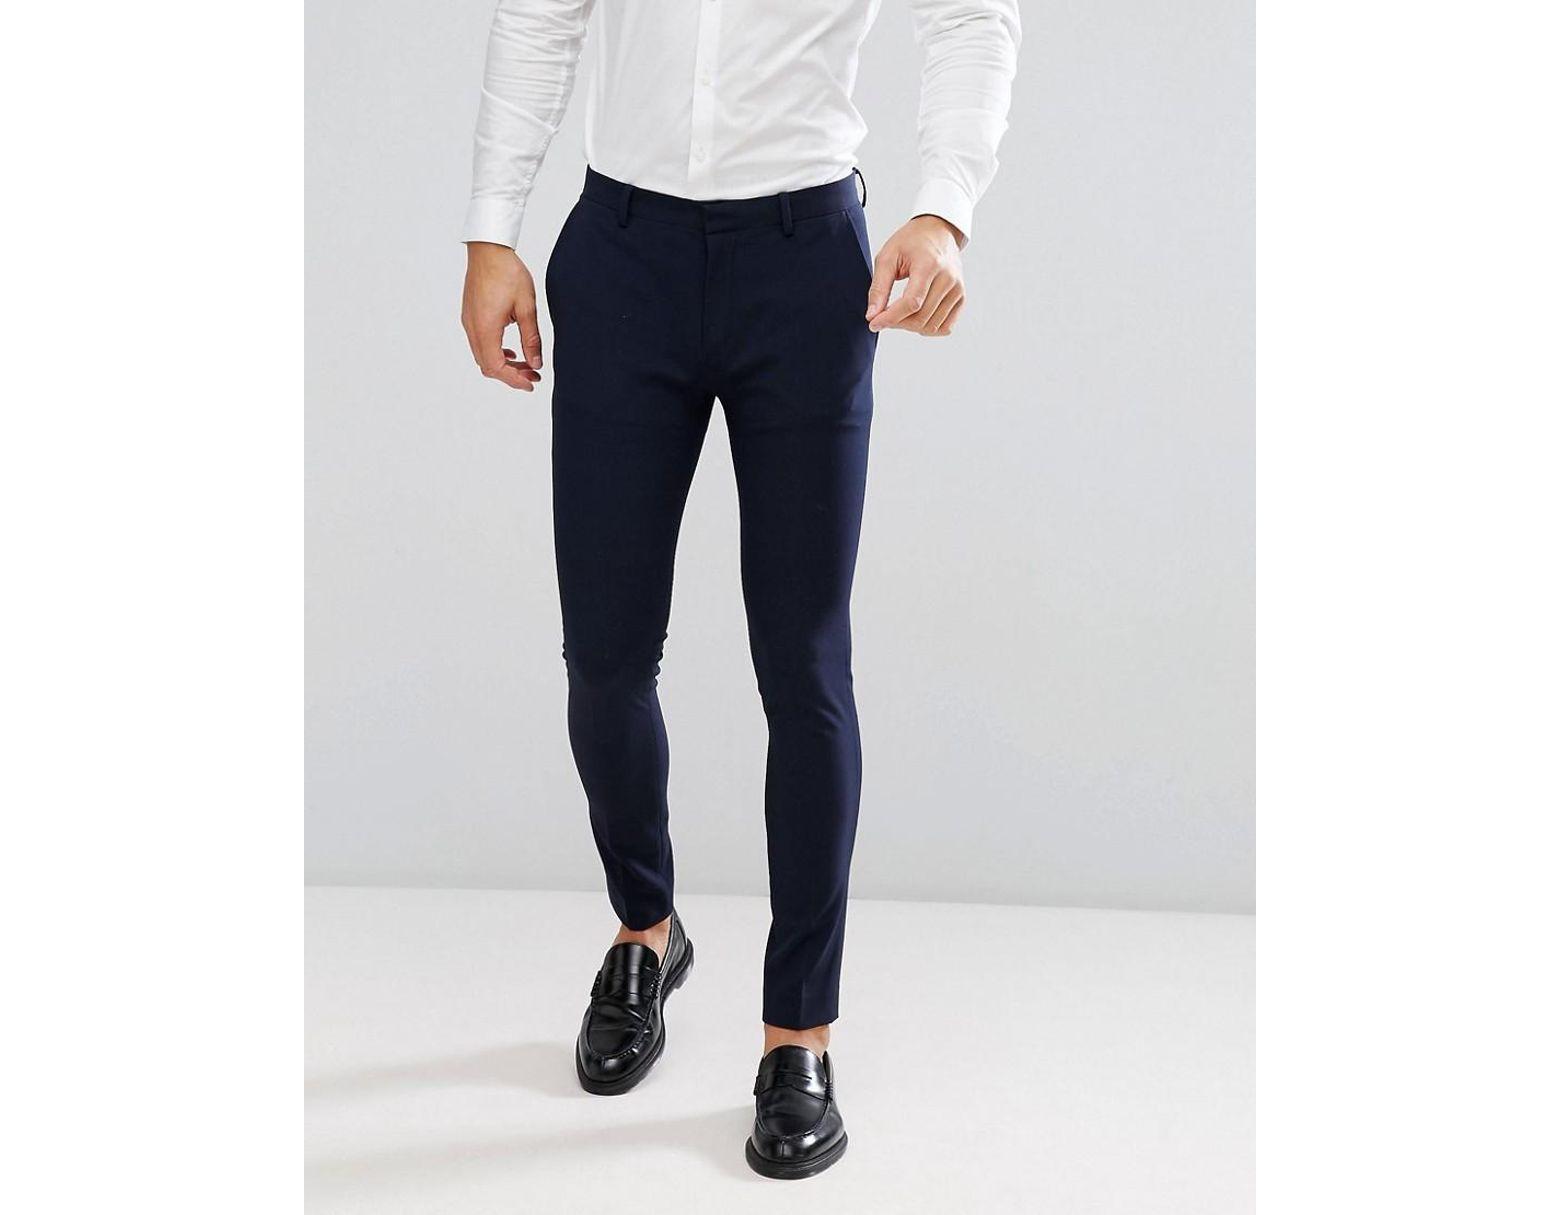 Super Costume Skinny Marine Homme Pantalon Bleu De Nvnm80Ow